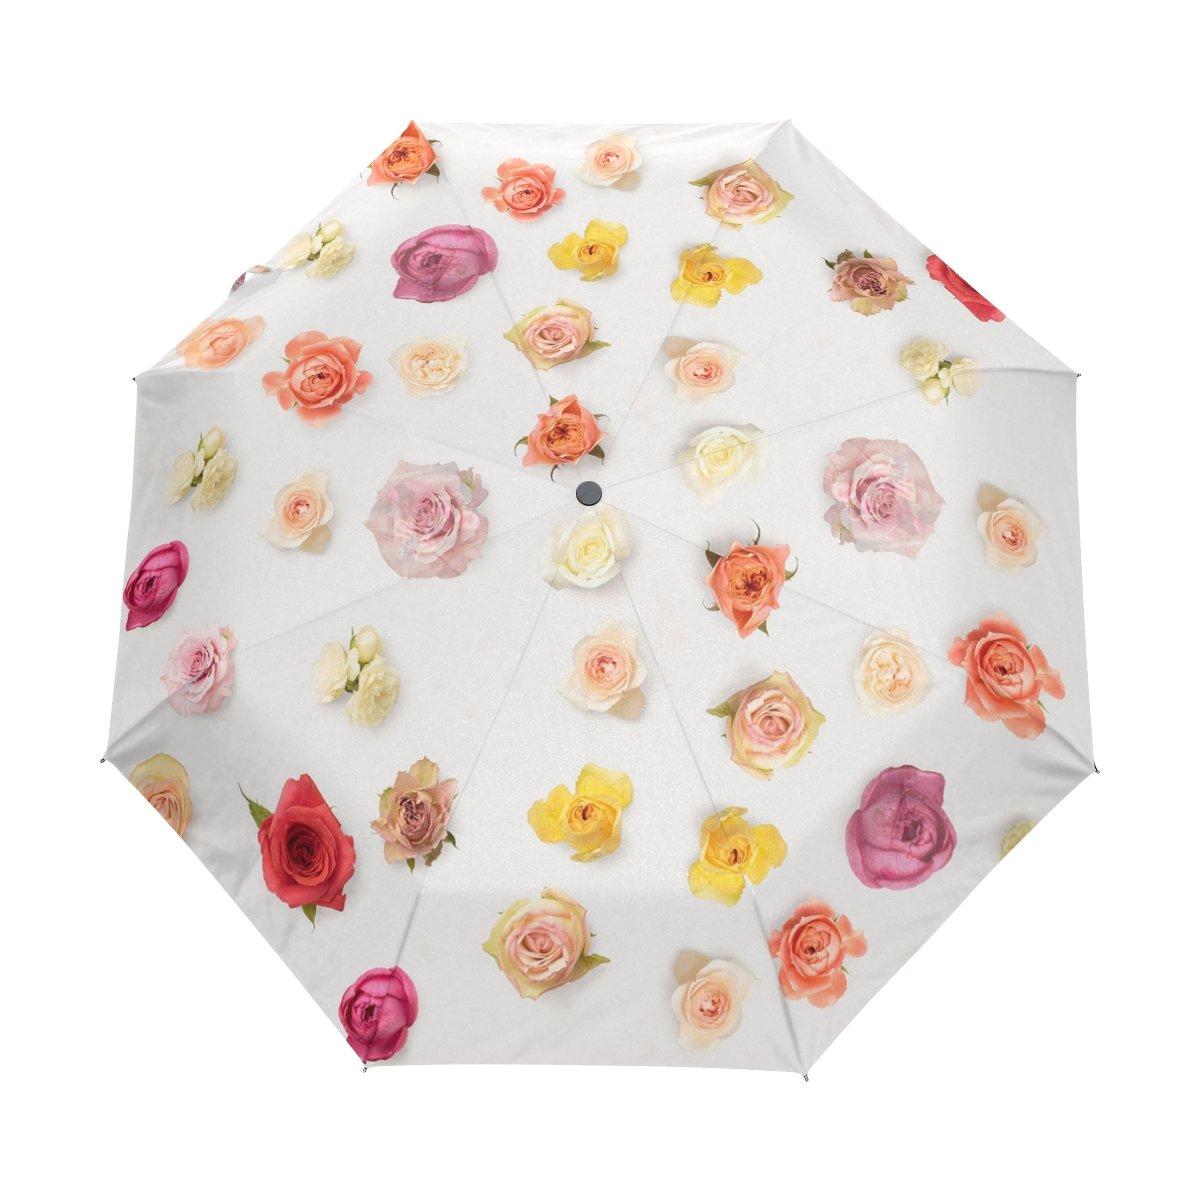 Floral Auto-open Windproof Travel Umbrella